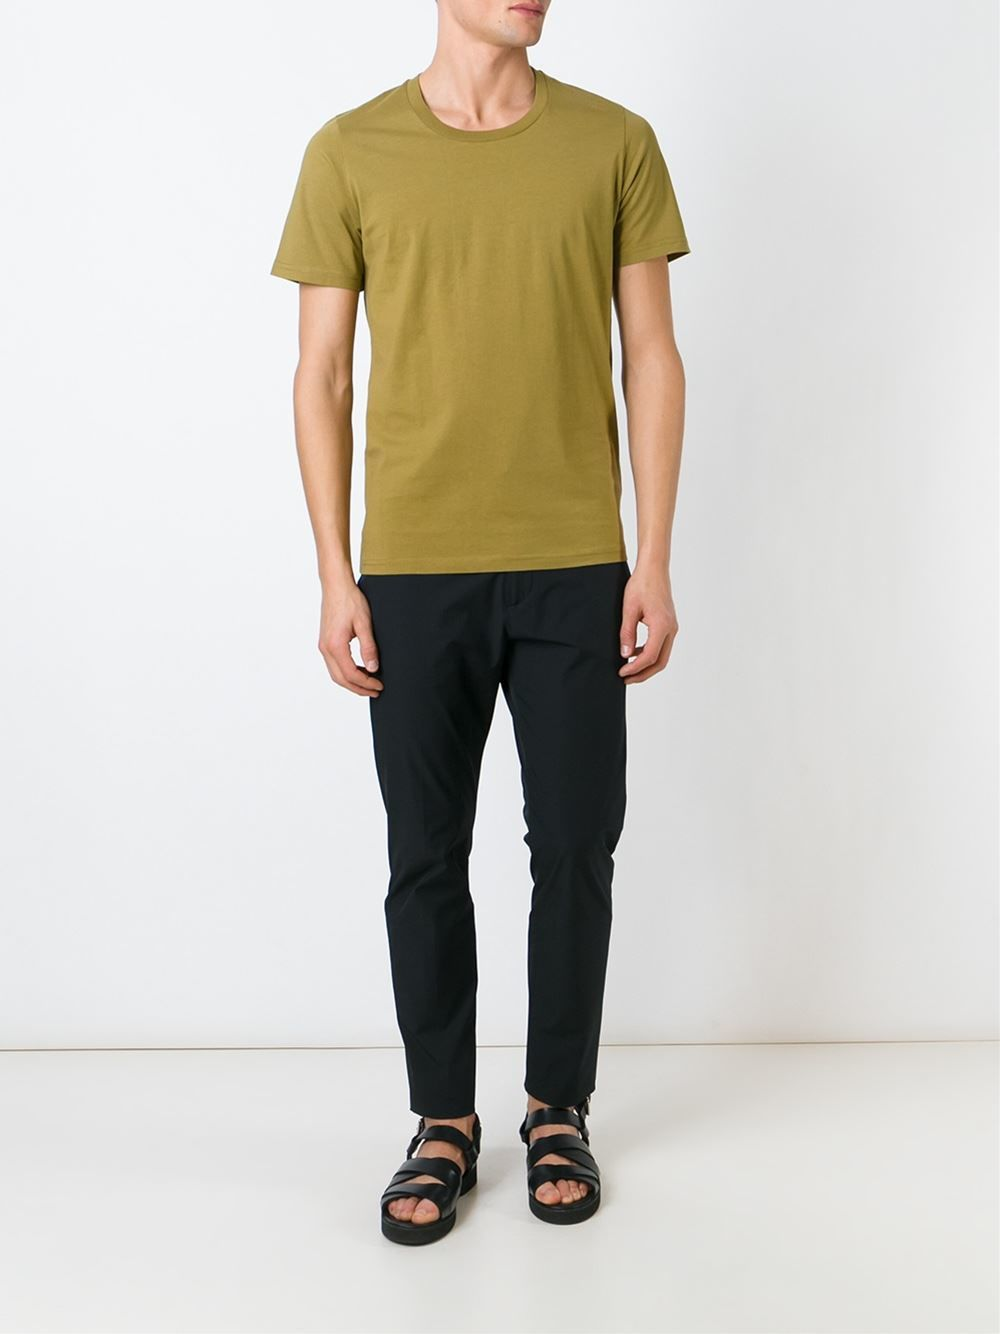 MAISON MARGIELA /// メゾンマルジェラ Classic T-Shirts 3Pcs Set クラシックTシャツ3枚セット